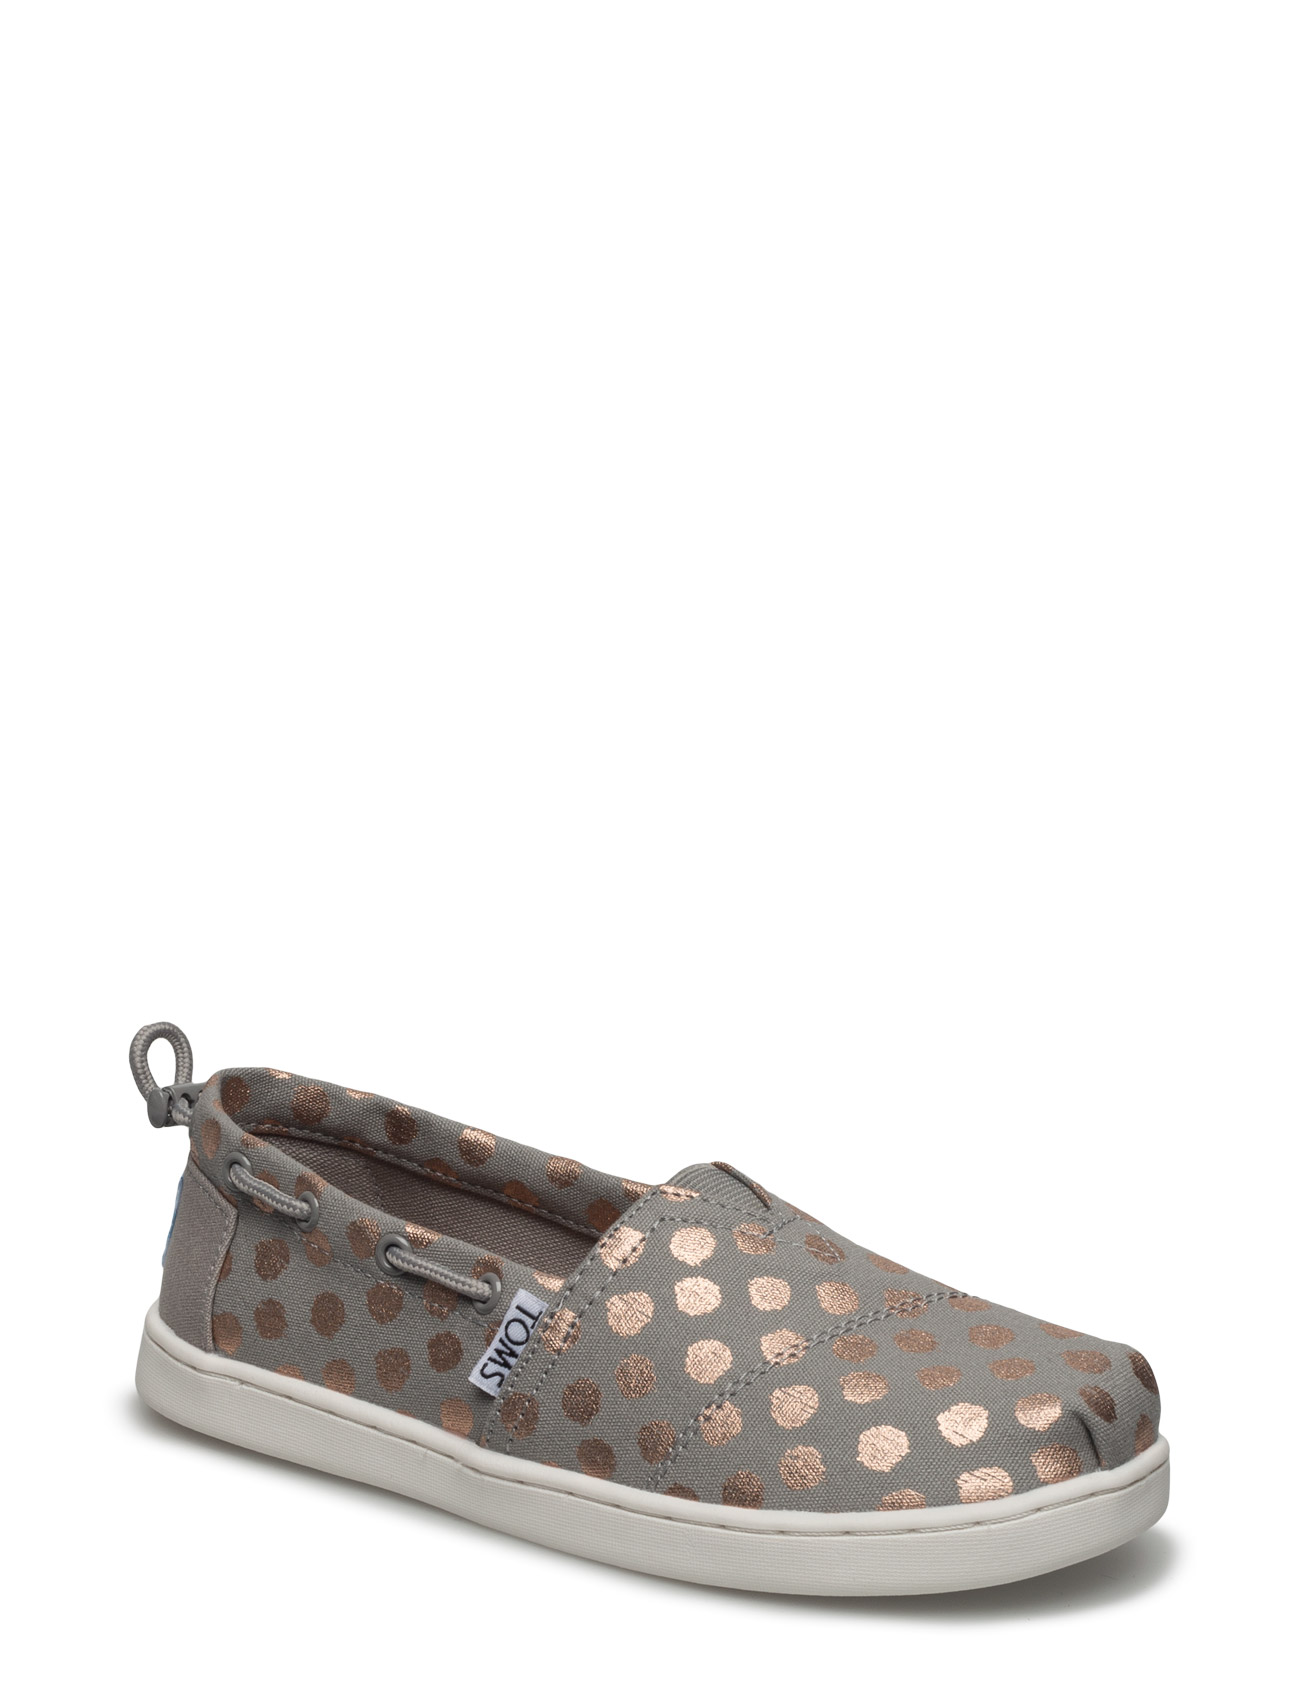 Drizzle Grey/Rose Gold Foil P Bimini TOMS Sko & Sneakers til Børn i